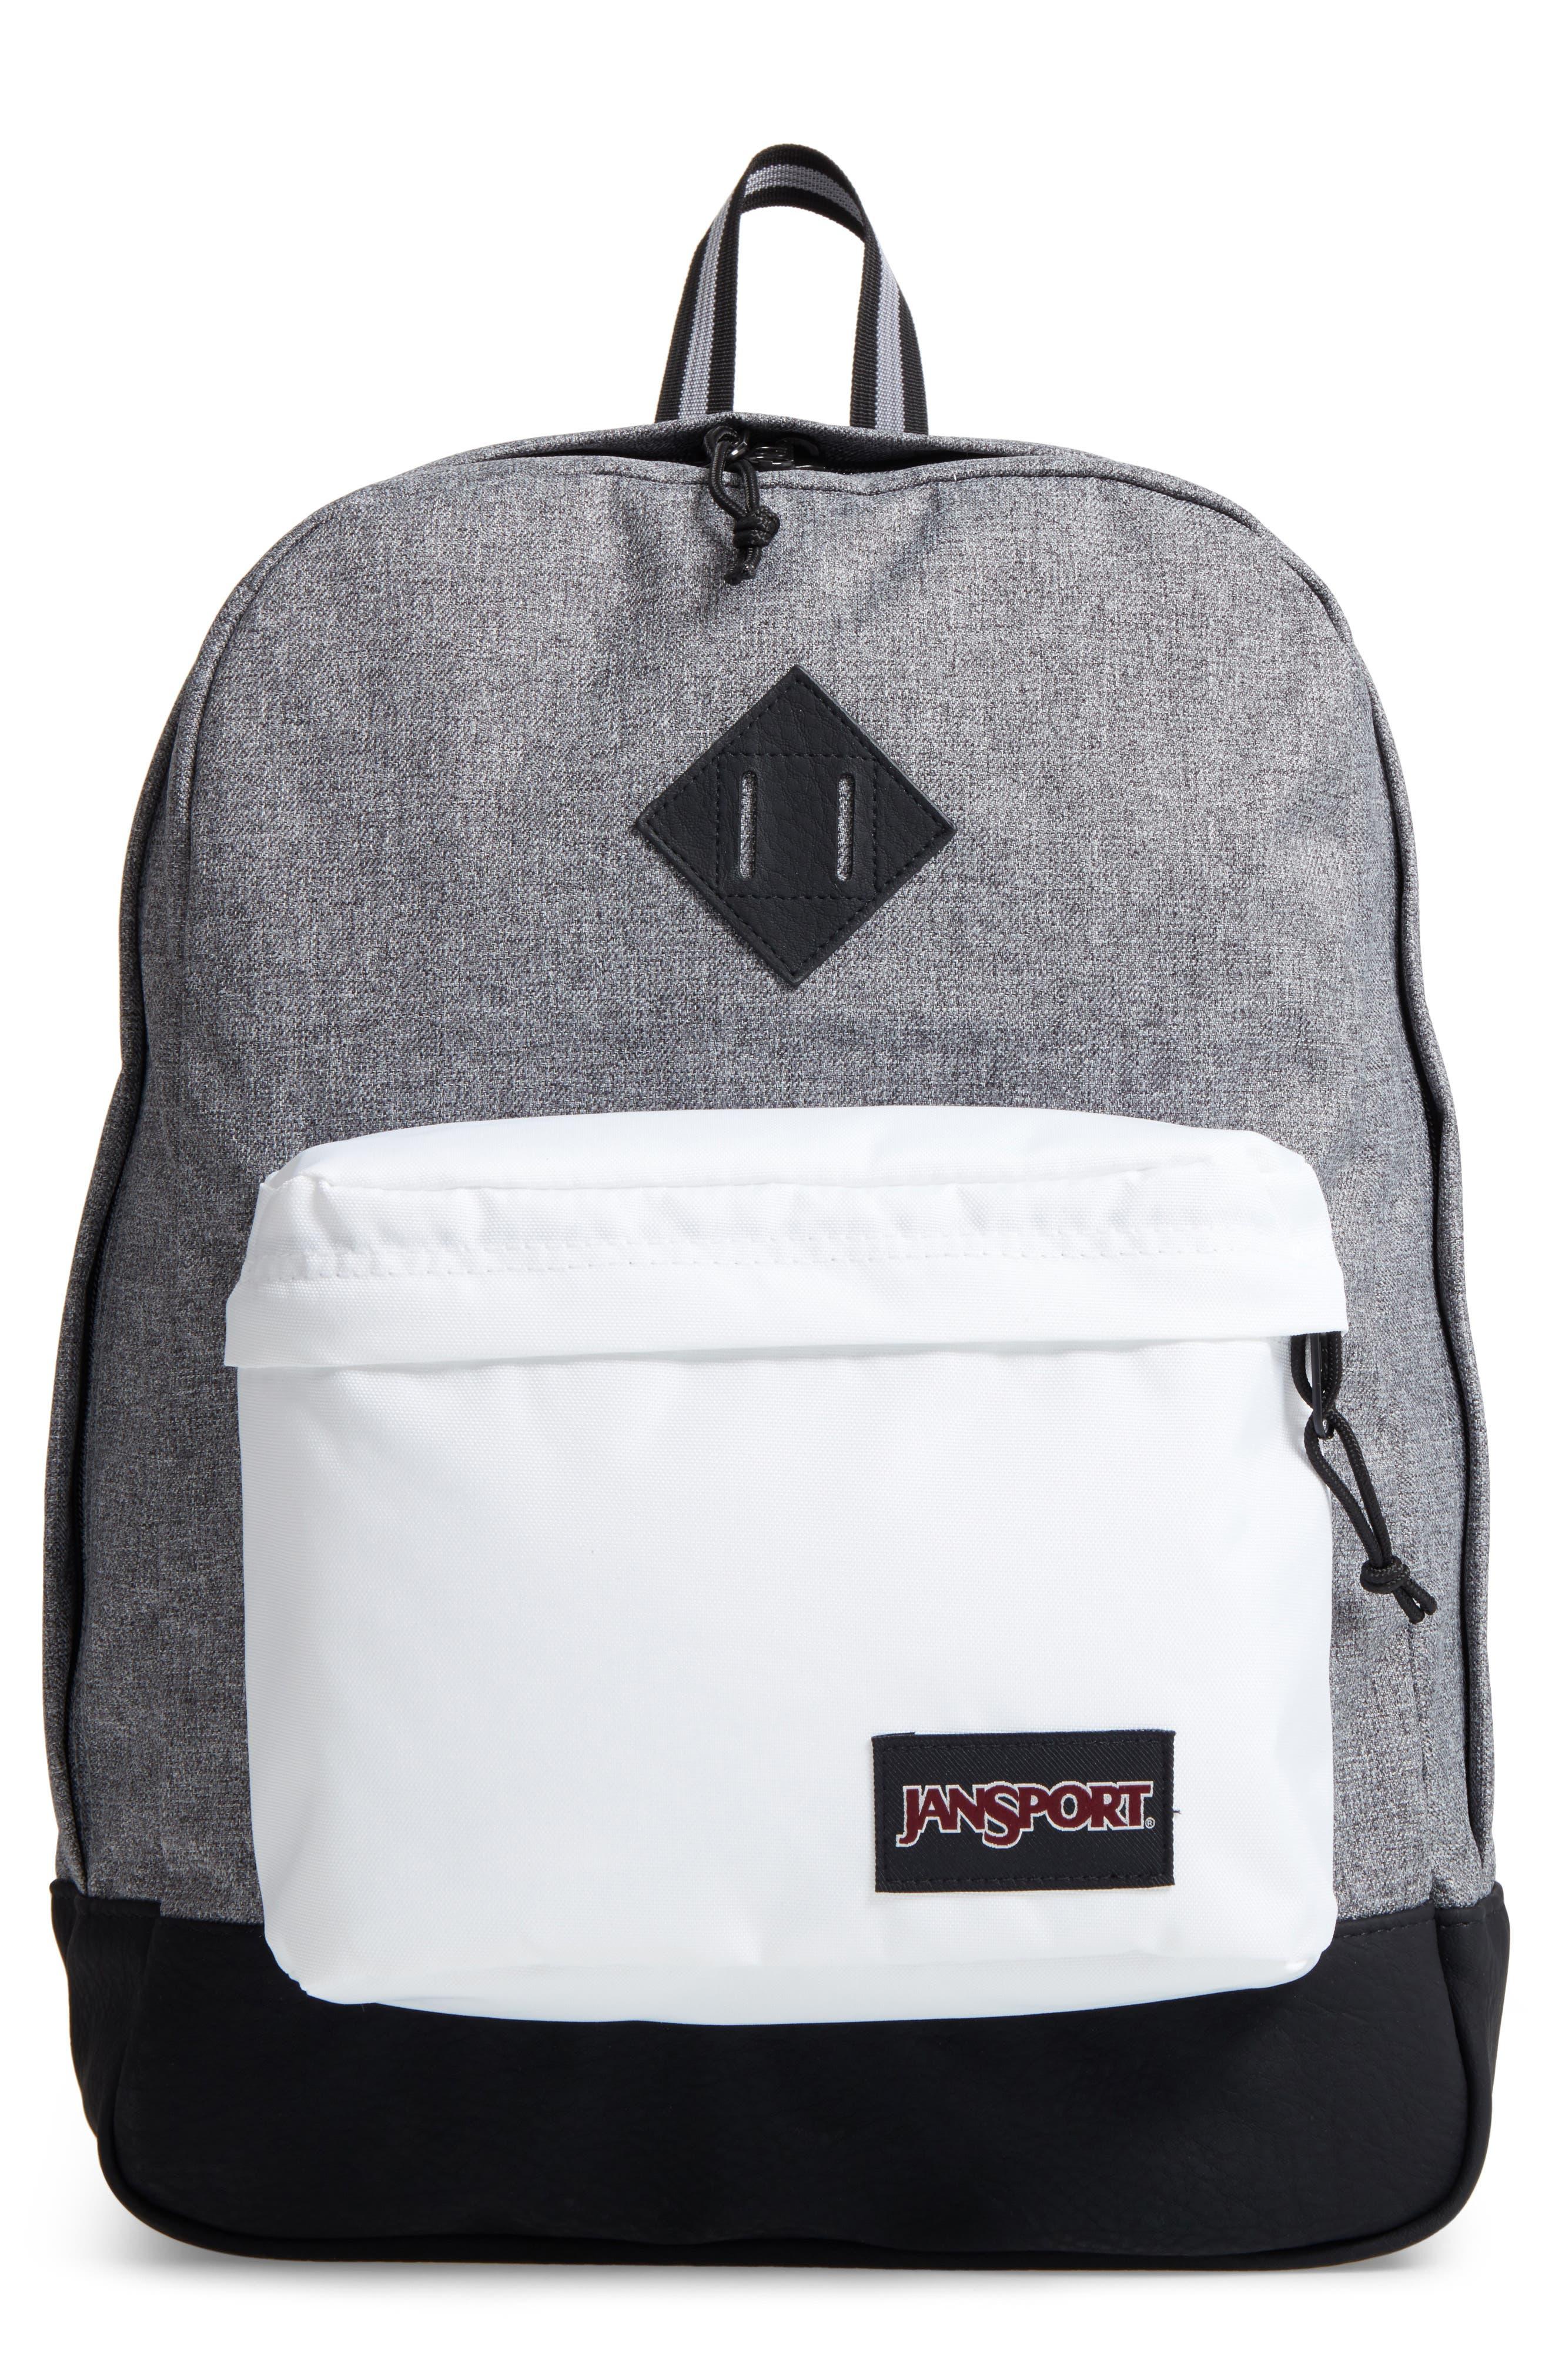 Super FX DL Backpack,                             Main thumbnail 1, color,                             001